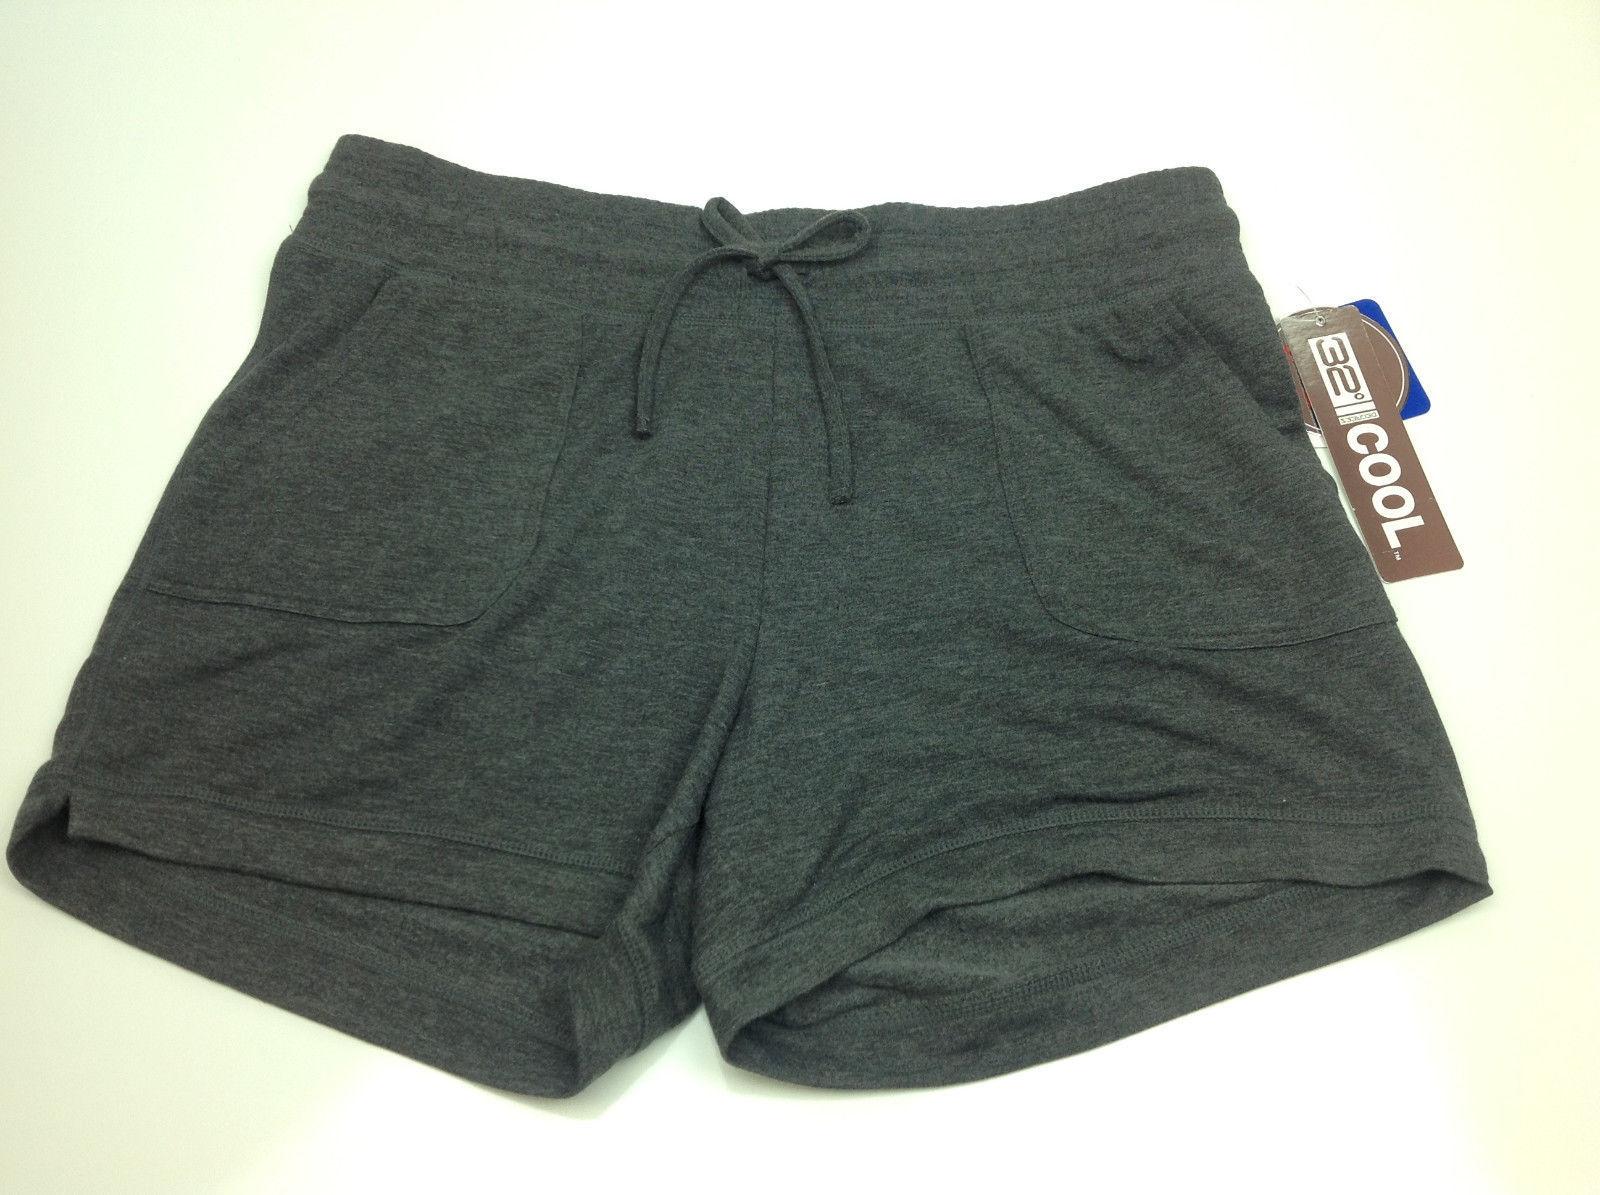 32 Degrees CoolTM Ladies' Fleece Short. image 8